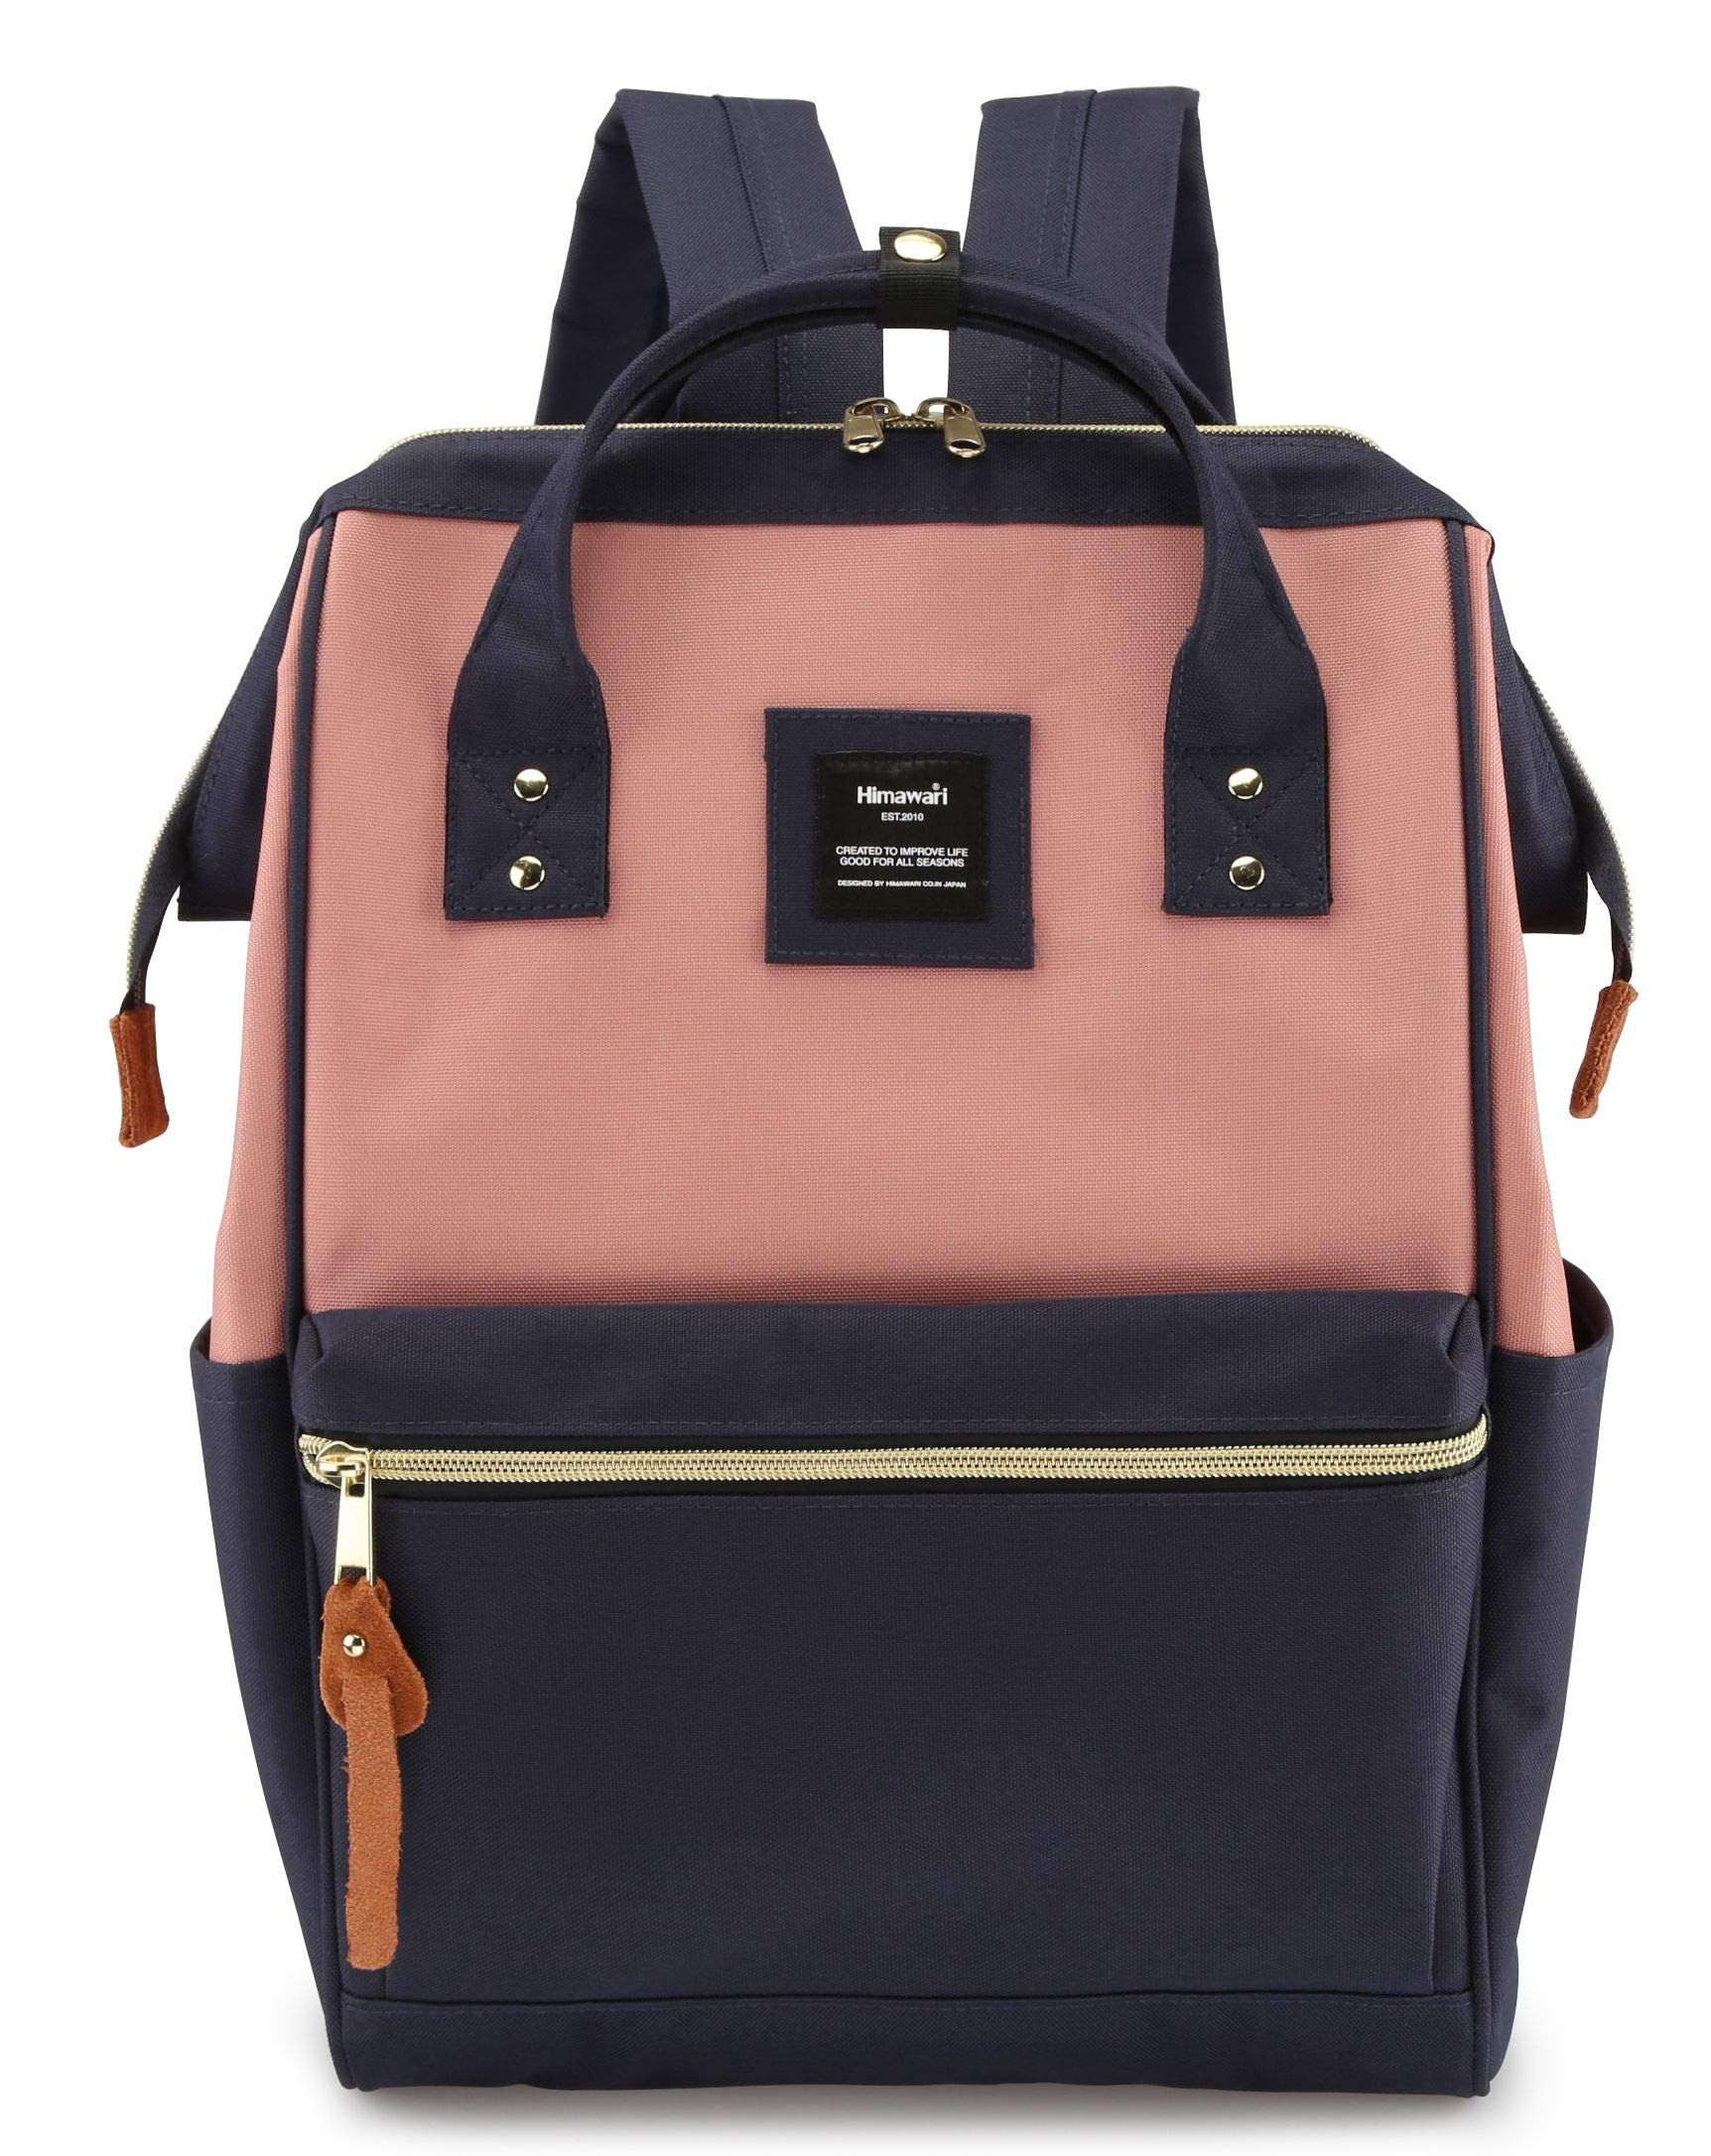 Himawari Laptop Backpack Travel Backpack With USB Charging Port Large Diaper Bag Doctor Bag School Backpack for Women&Men (XK-05#-USB L) by himawari (Image #1)